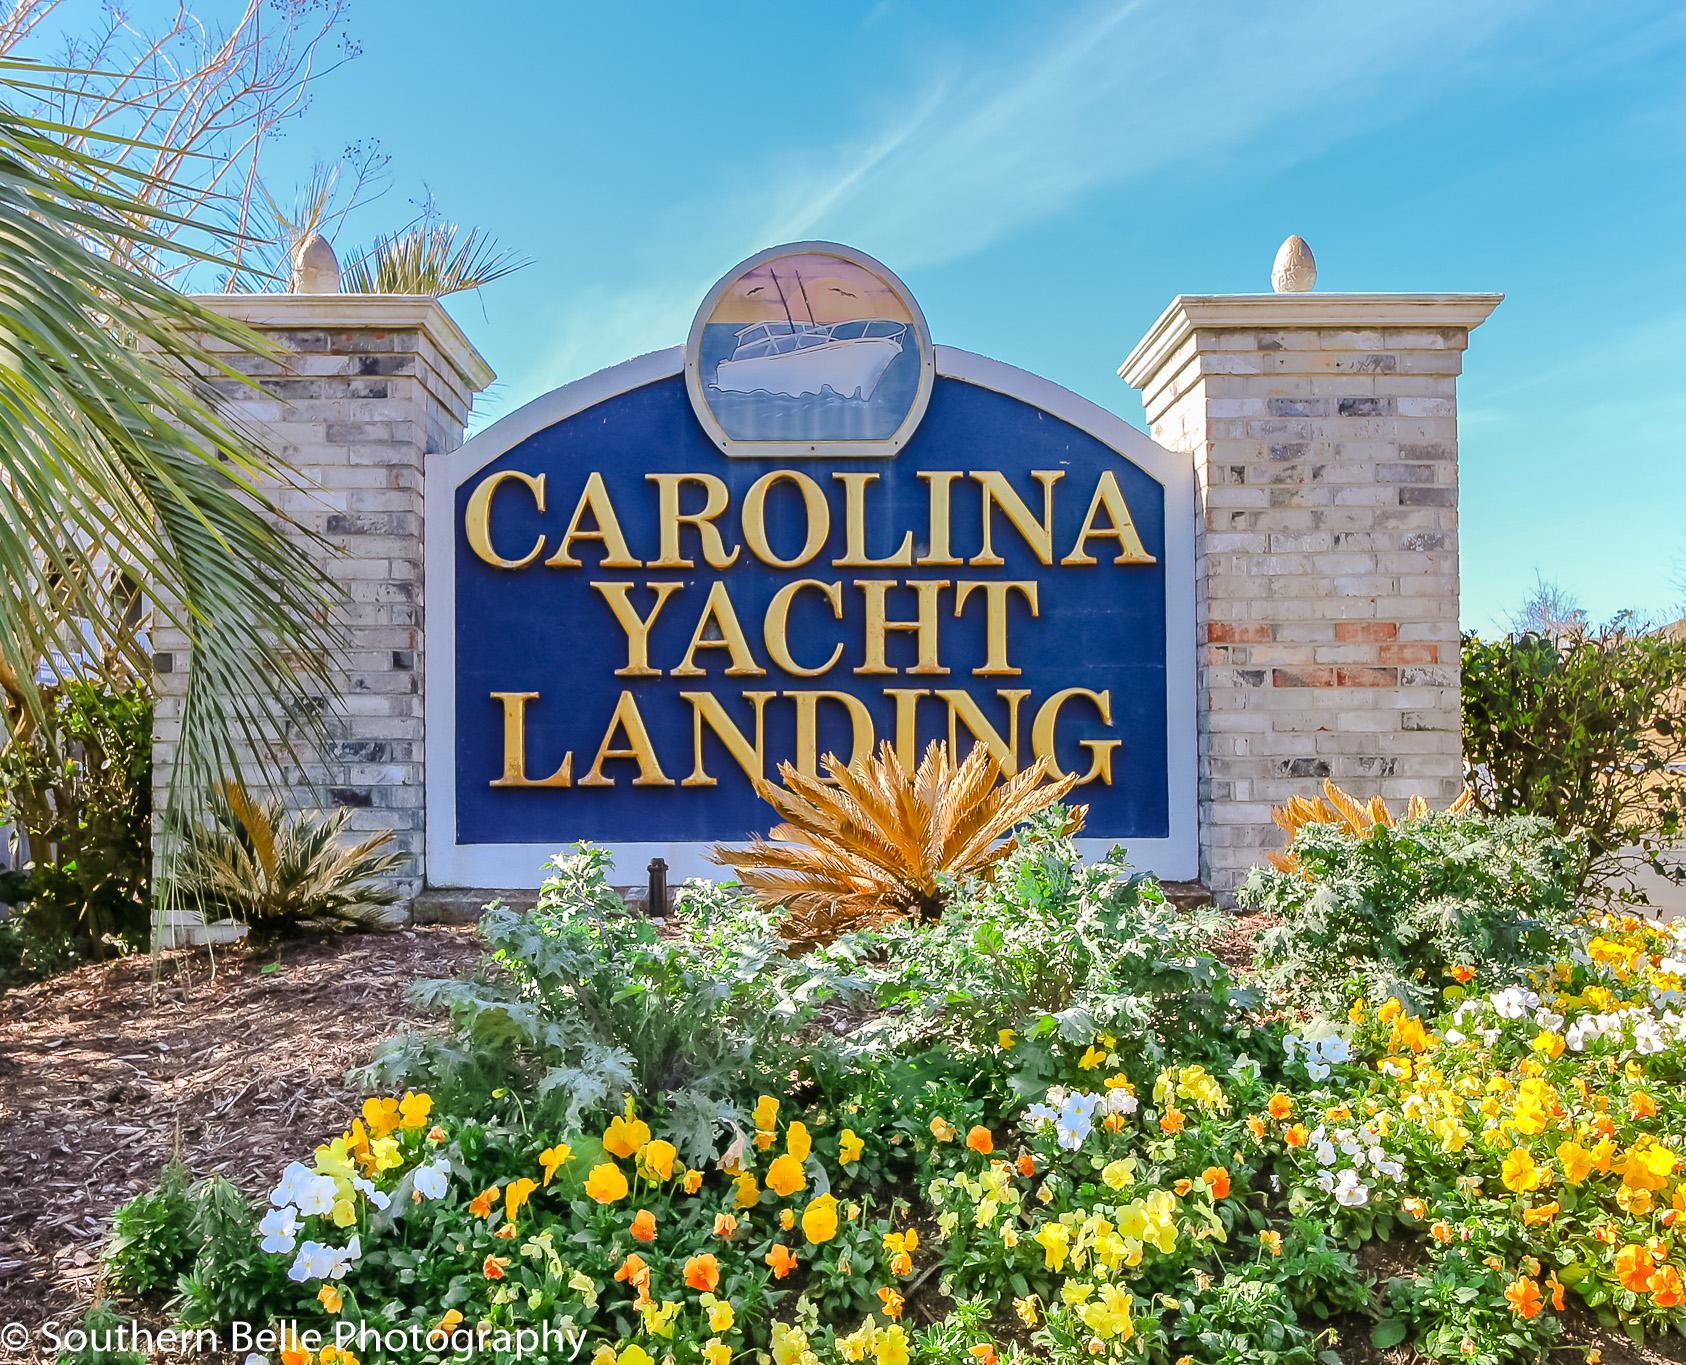 1. Carolina Yacht Landing Entrance WM